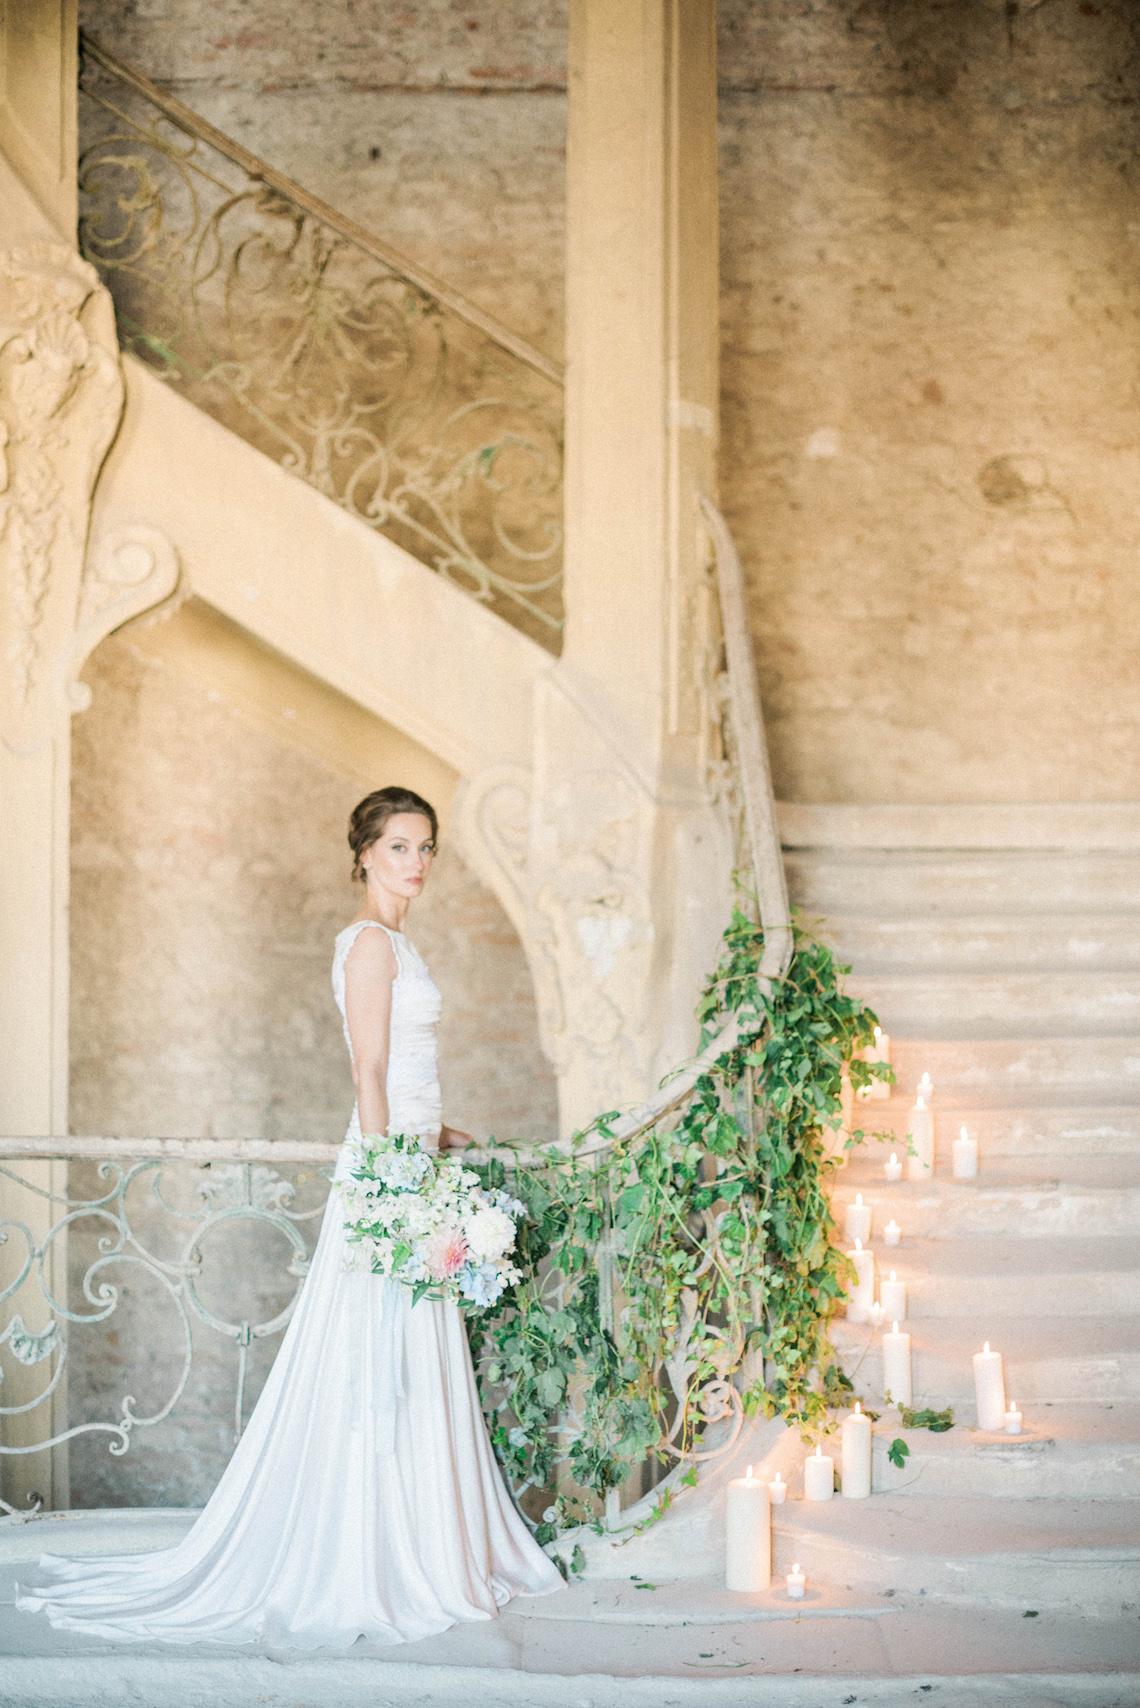 Ornate Candelit Peach & Blue Wedding Inspiration | Gabriela Jarkovska 28